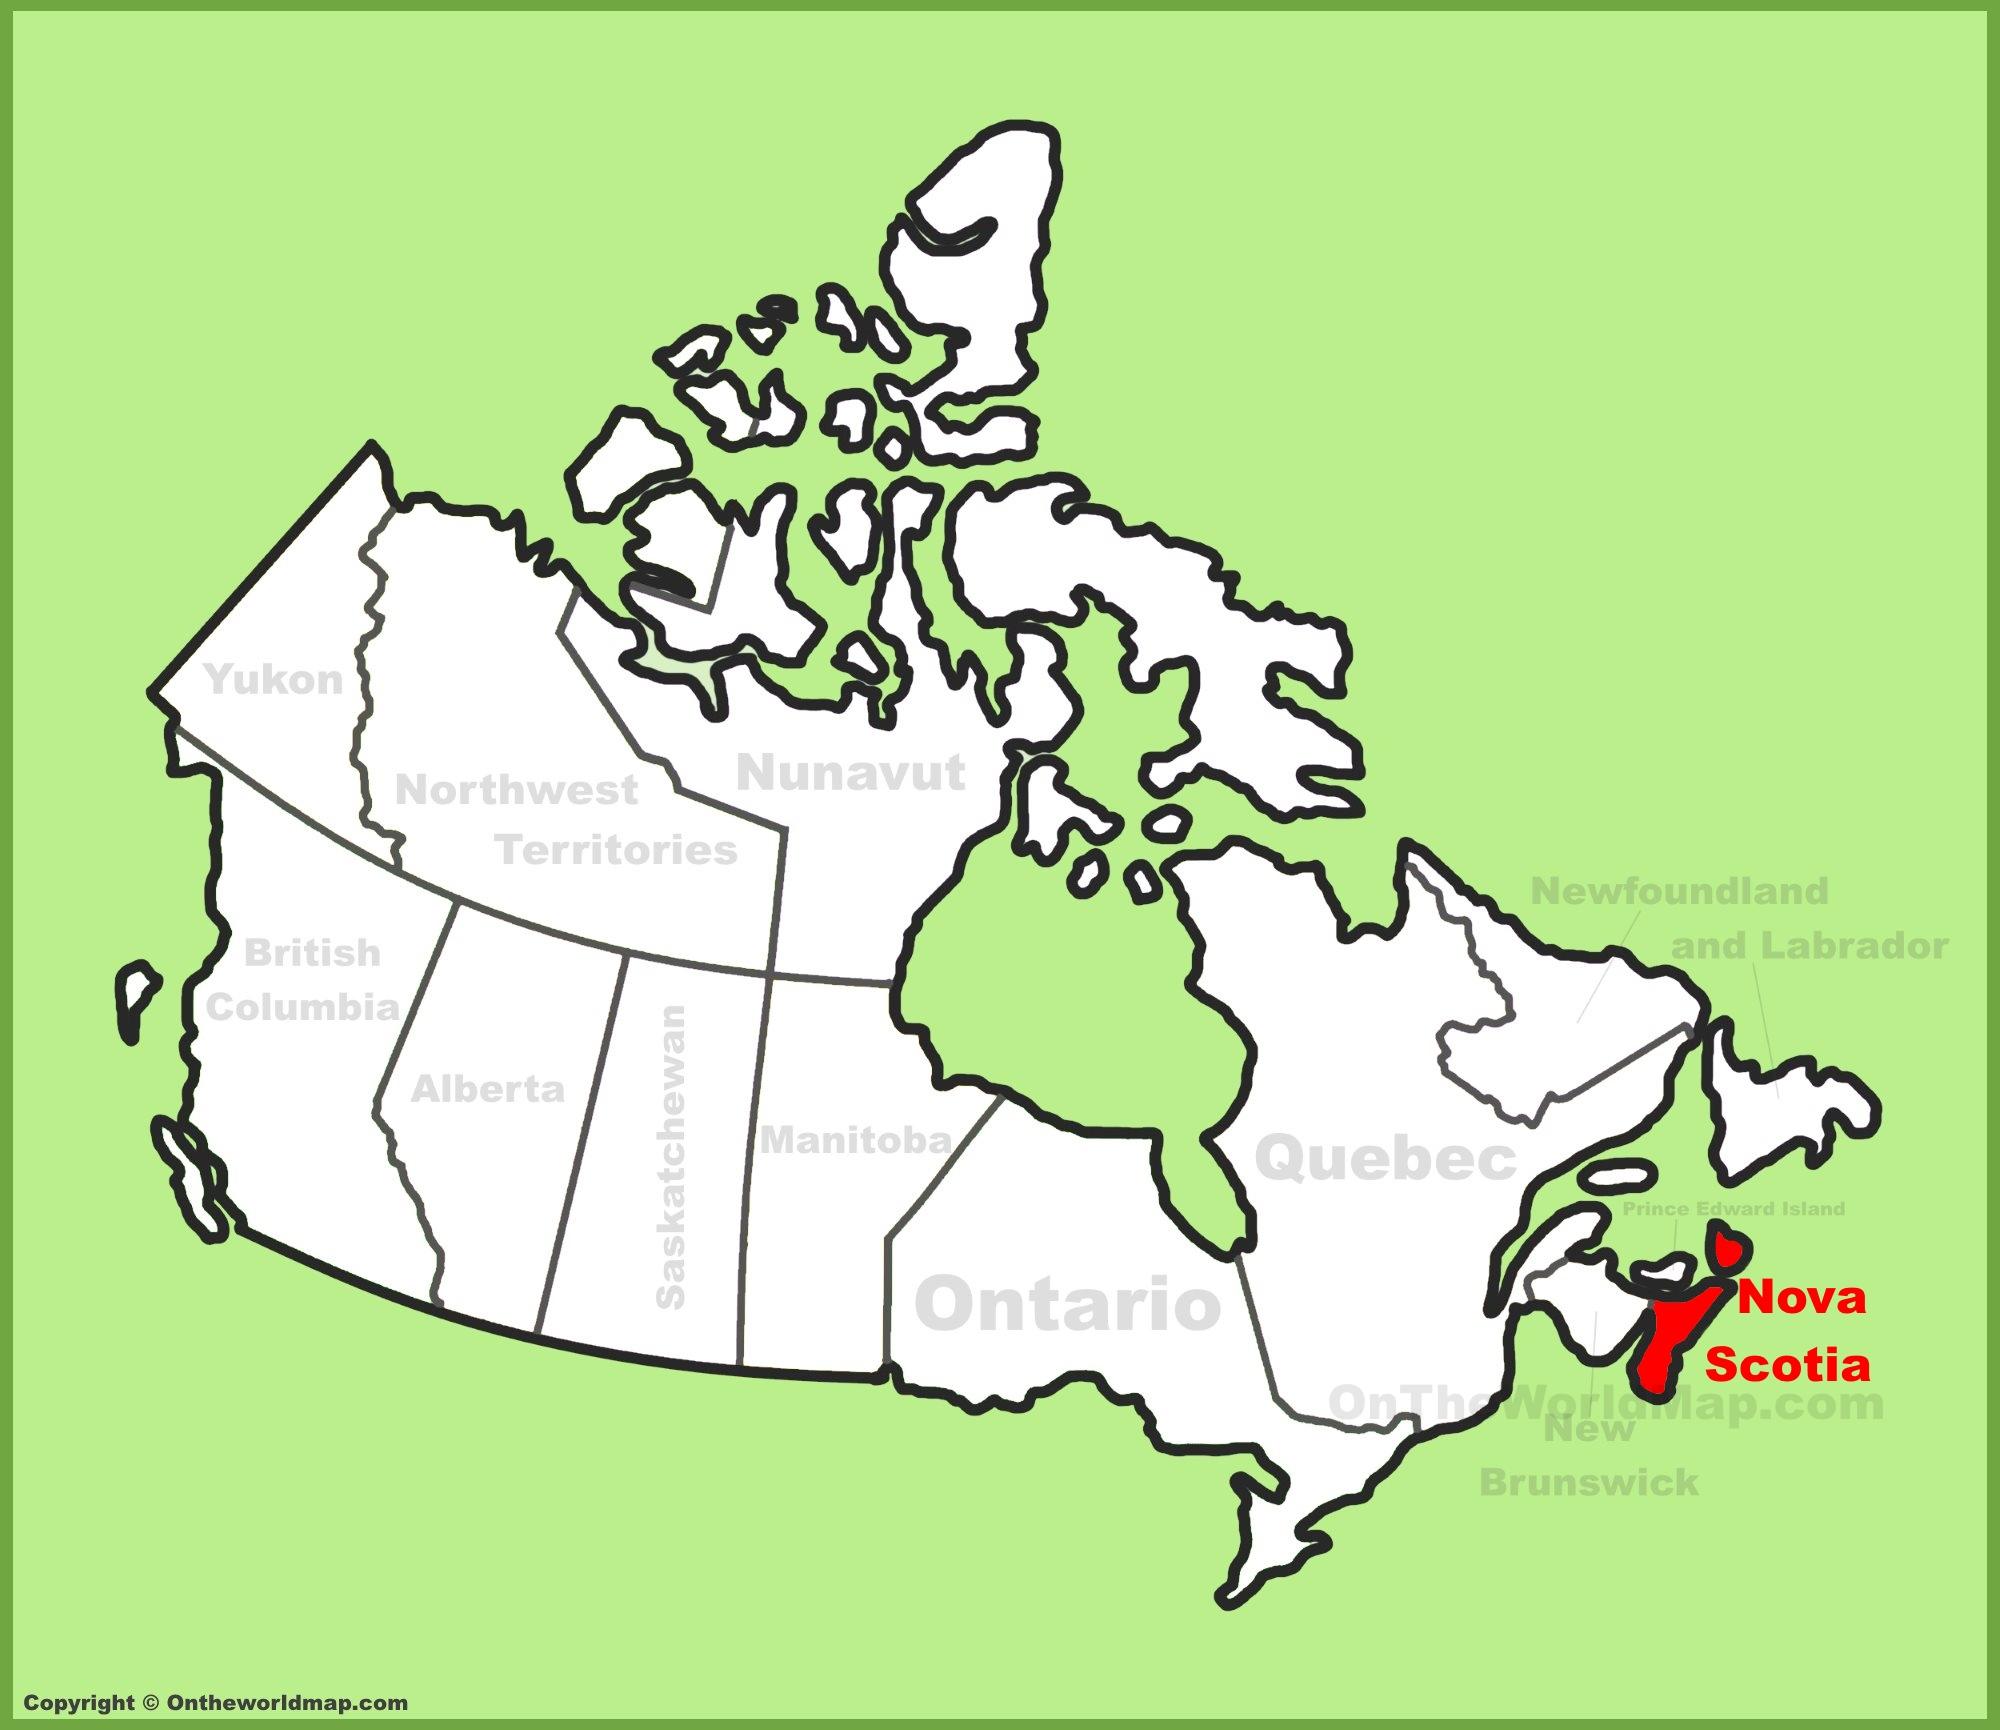 Nova Scotia location on the Canada Map